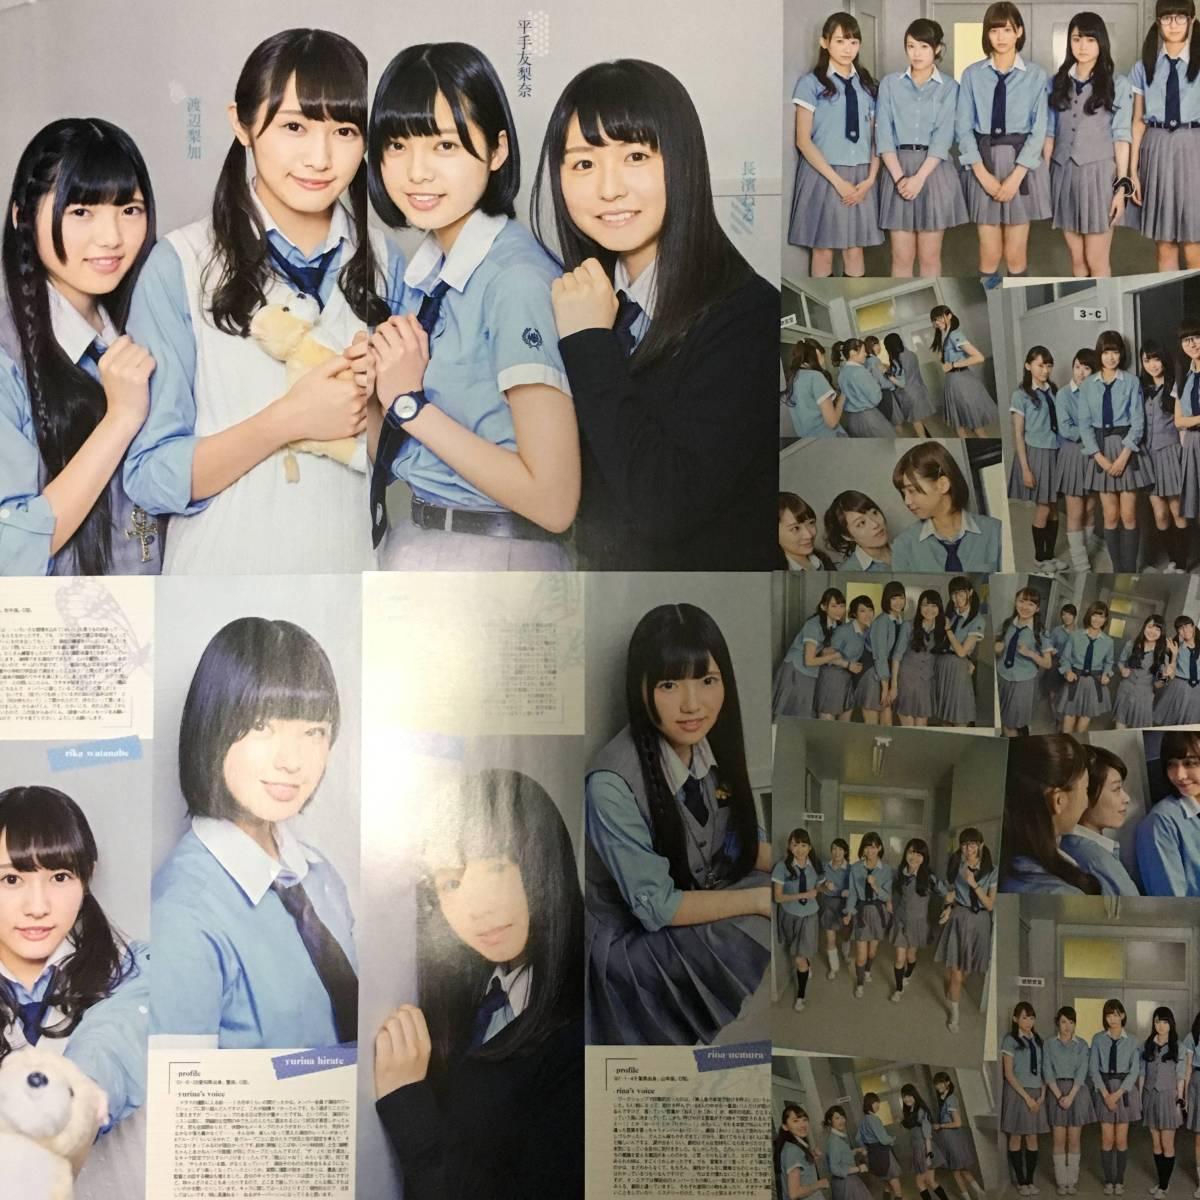 欅坂46 切り抜き 26P 平手友梨奈今泉佑唯鈴本美愉渡辺